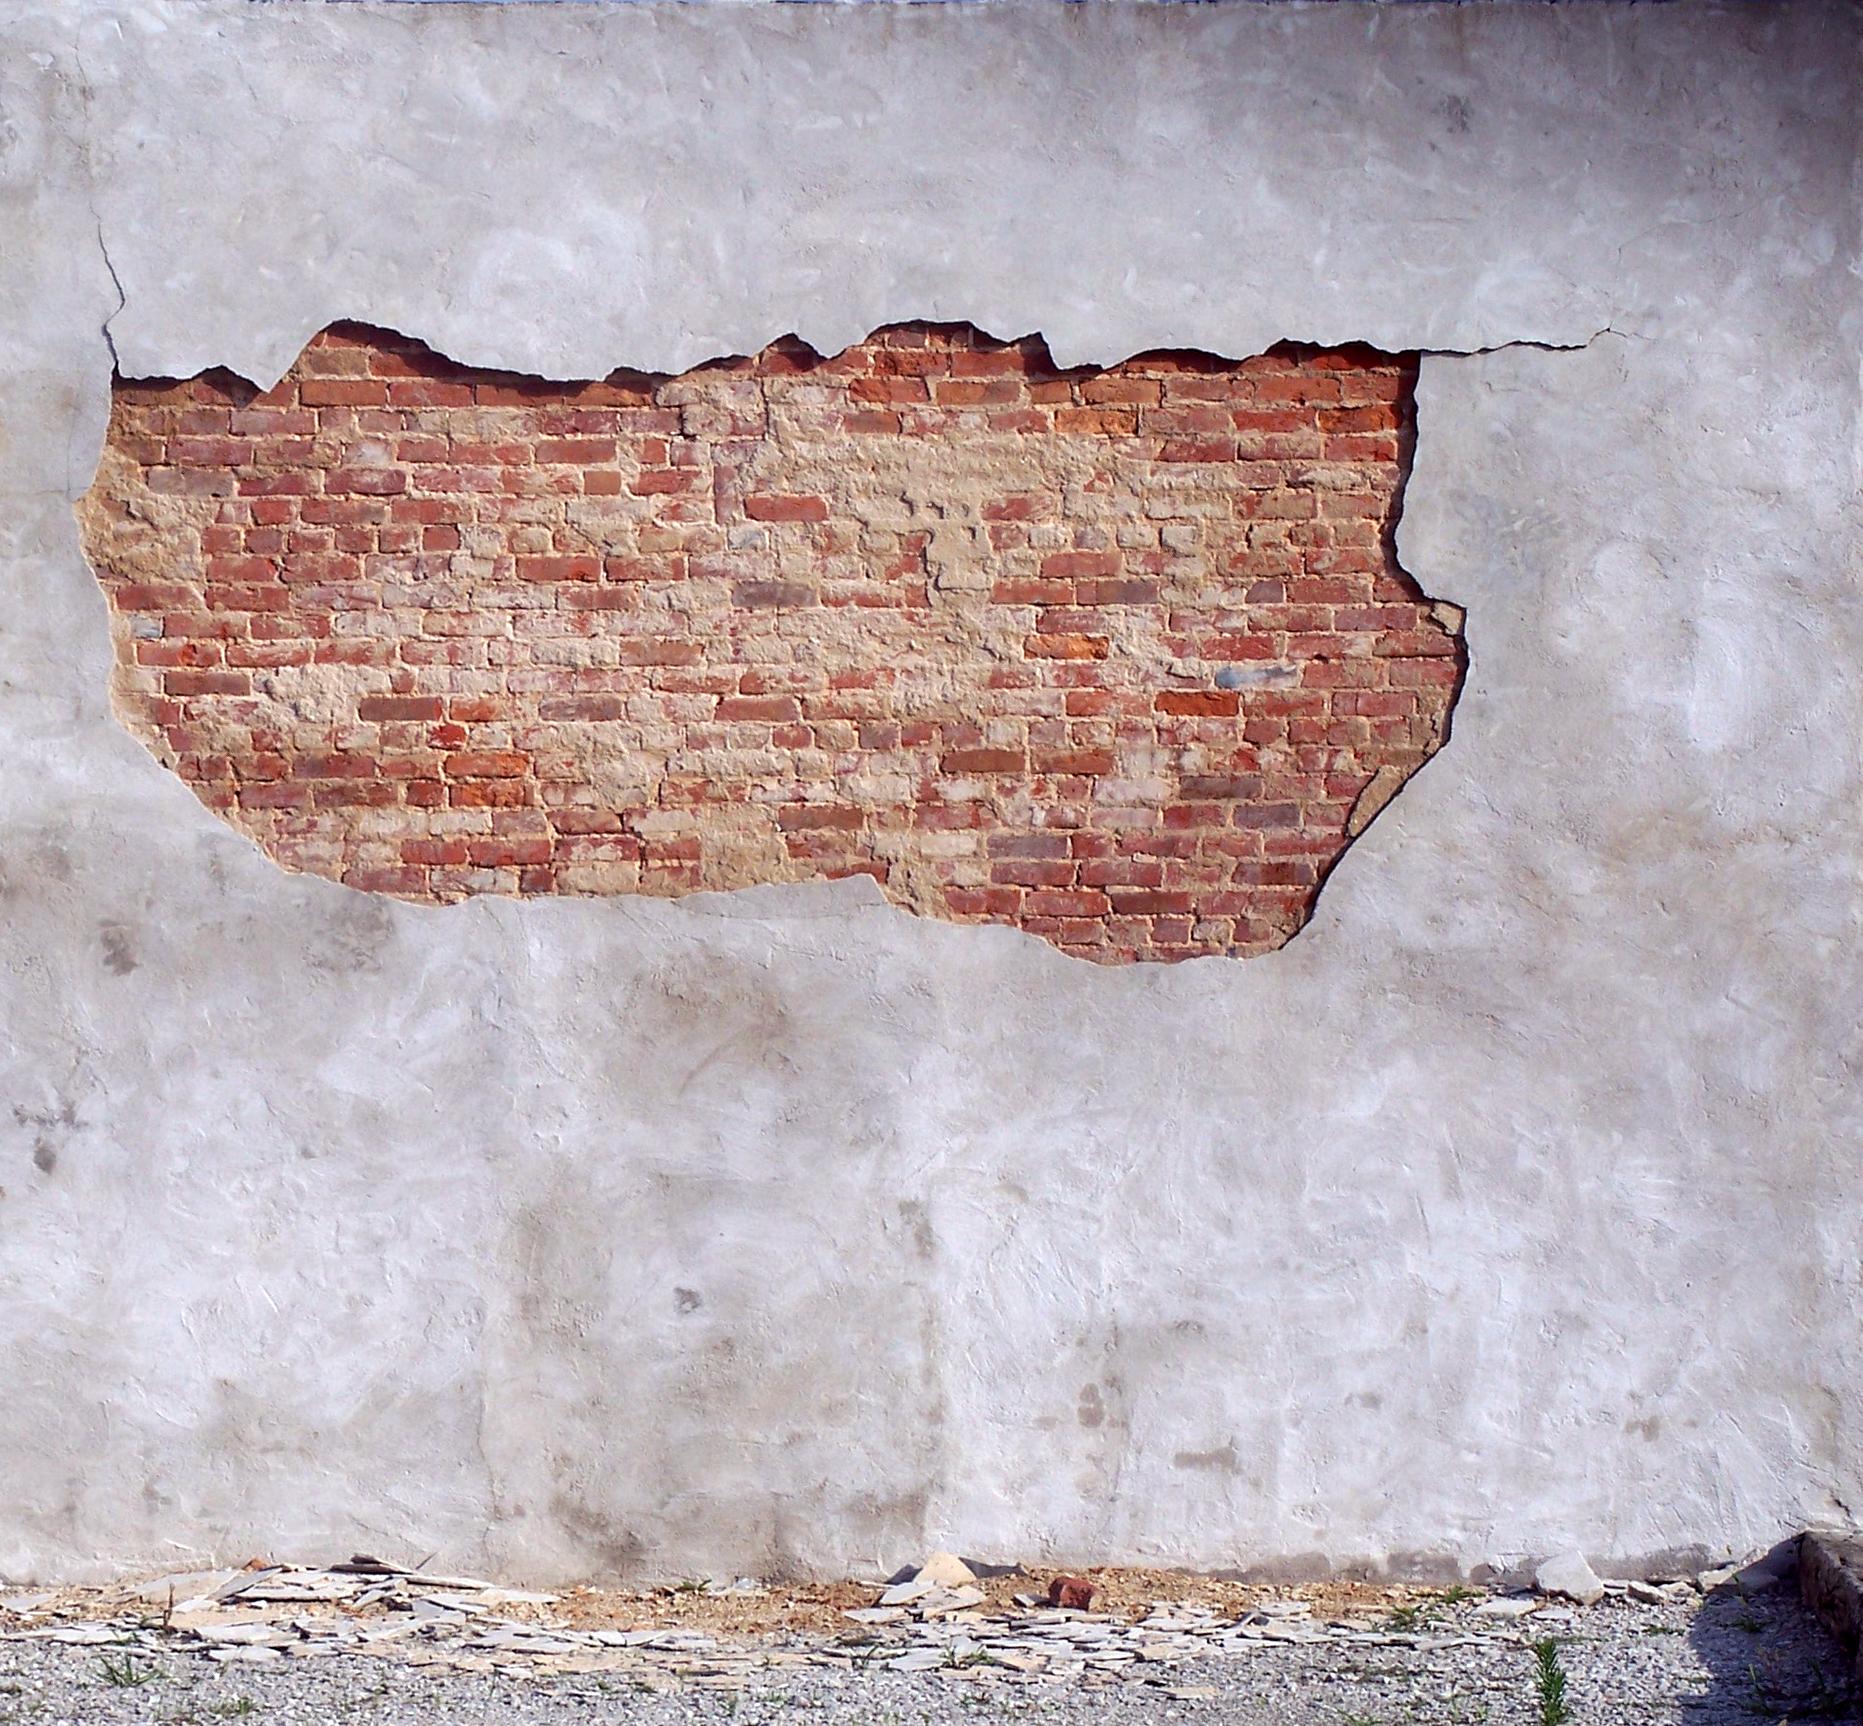 exposed brick - Google Search | Dark | Pinterest | Brick, Brick wall and Plaster walls